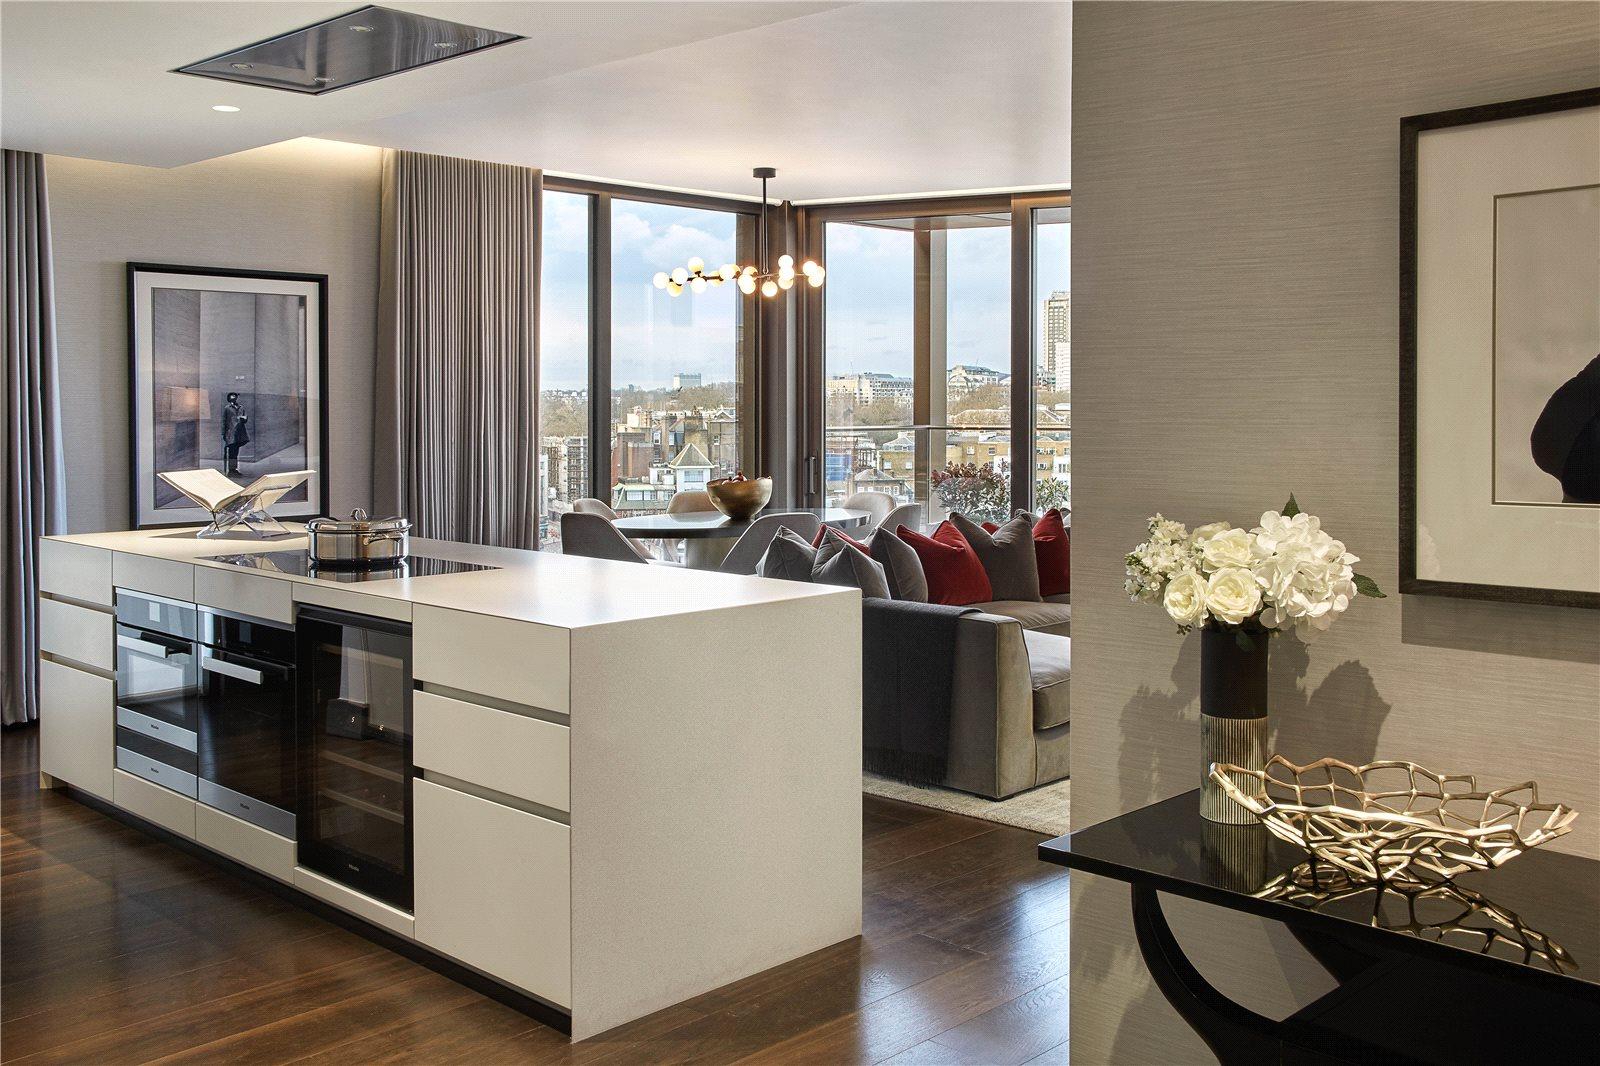 Апартаменты / Квартиры для того Продажа на Kings Gate, London, SW1E London, Англия